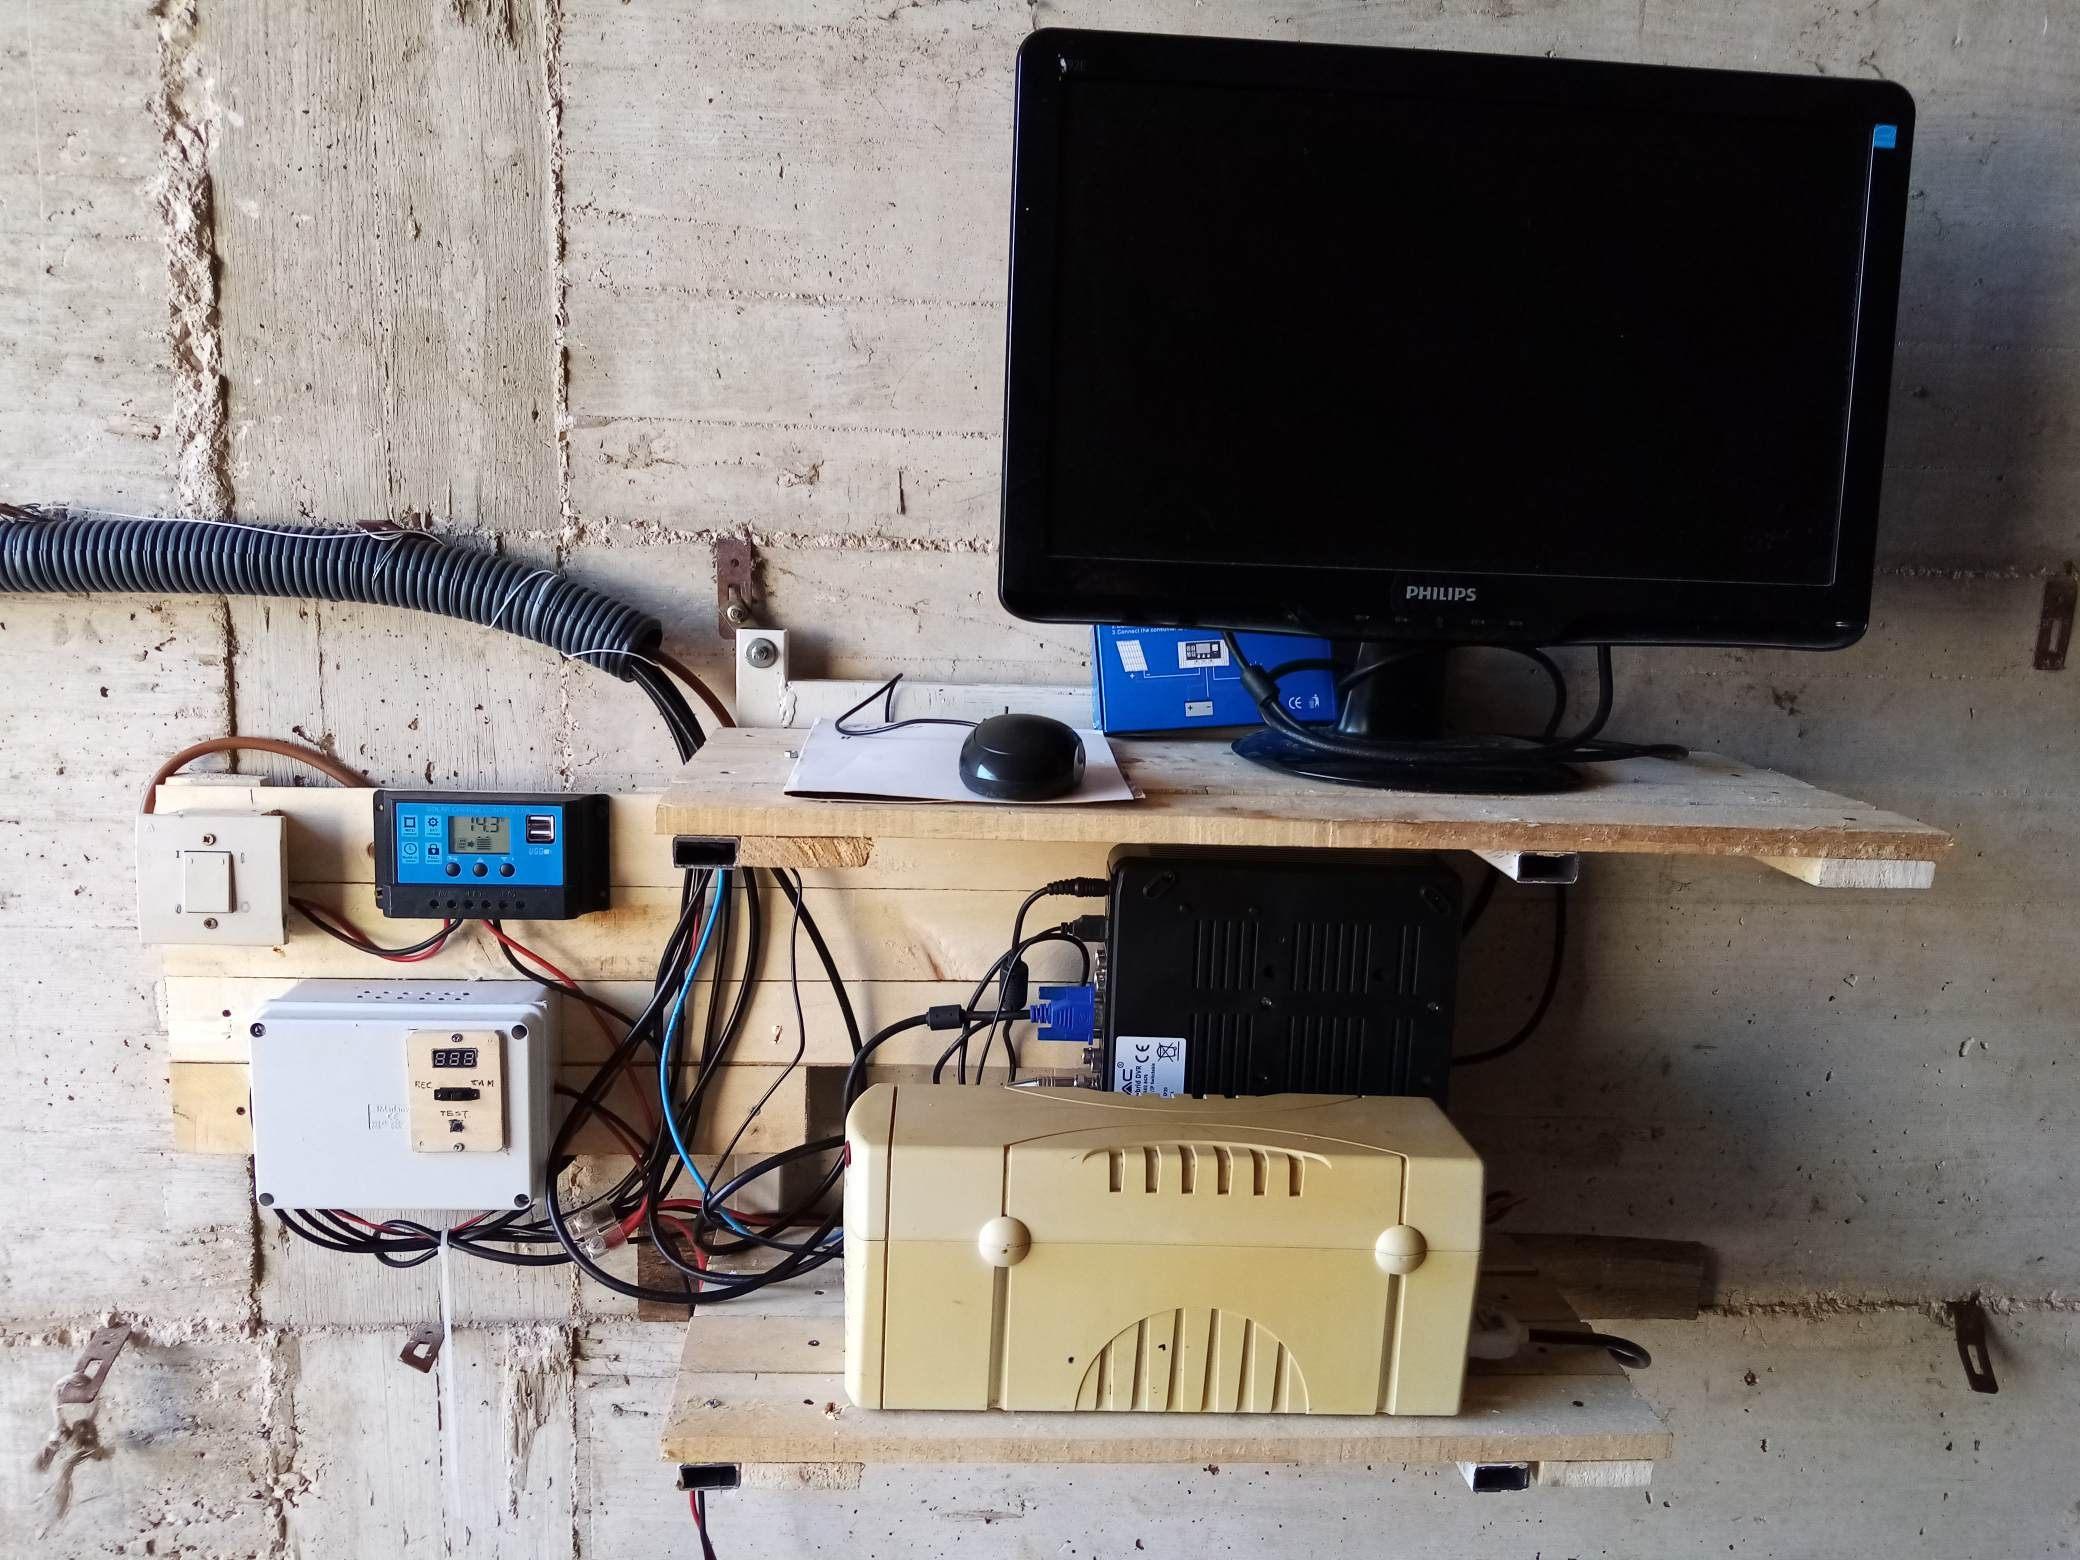 http://www.energialternativa.info/public/newforum/ForumEA/U/telecamera-3.jpg